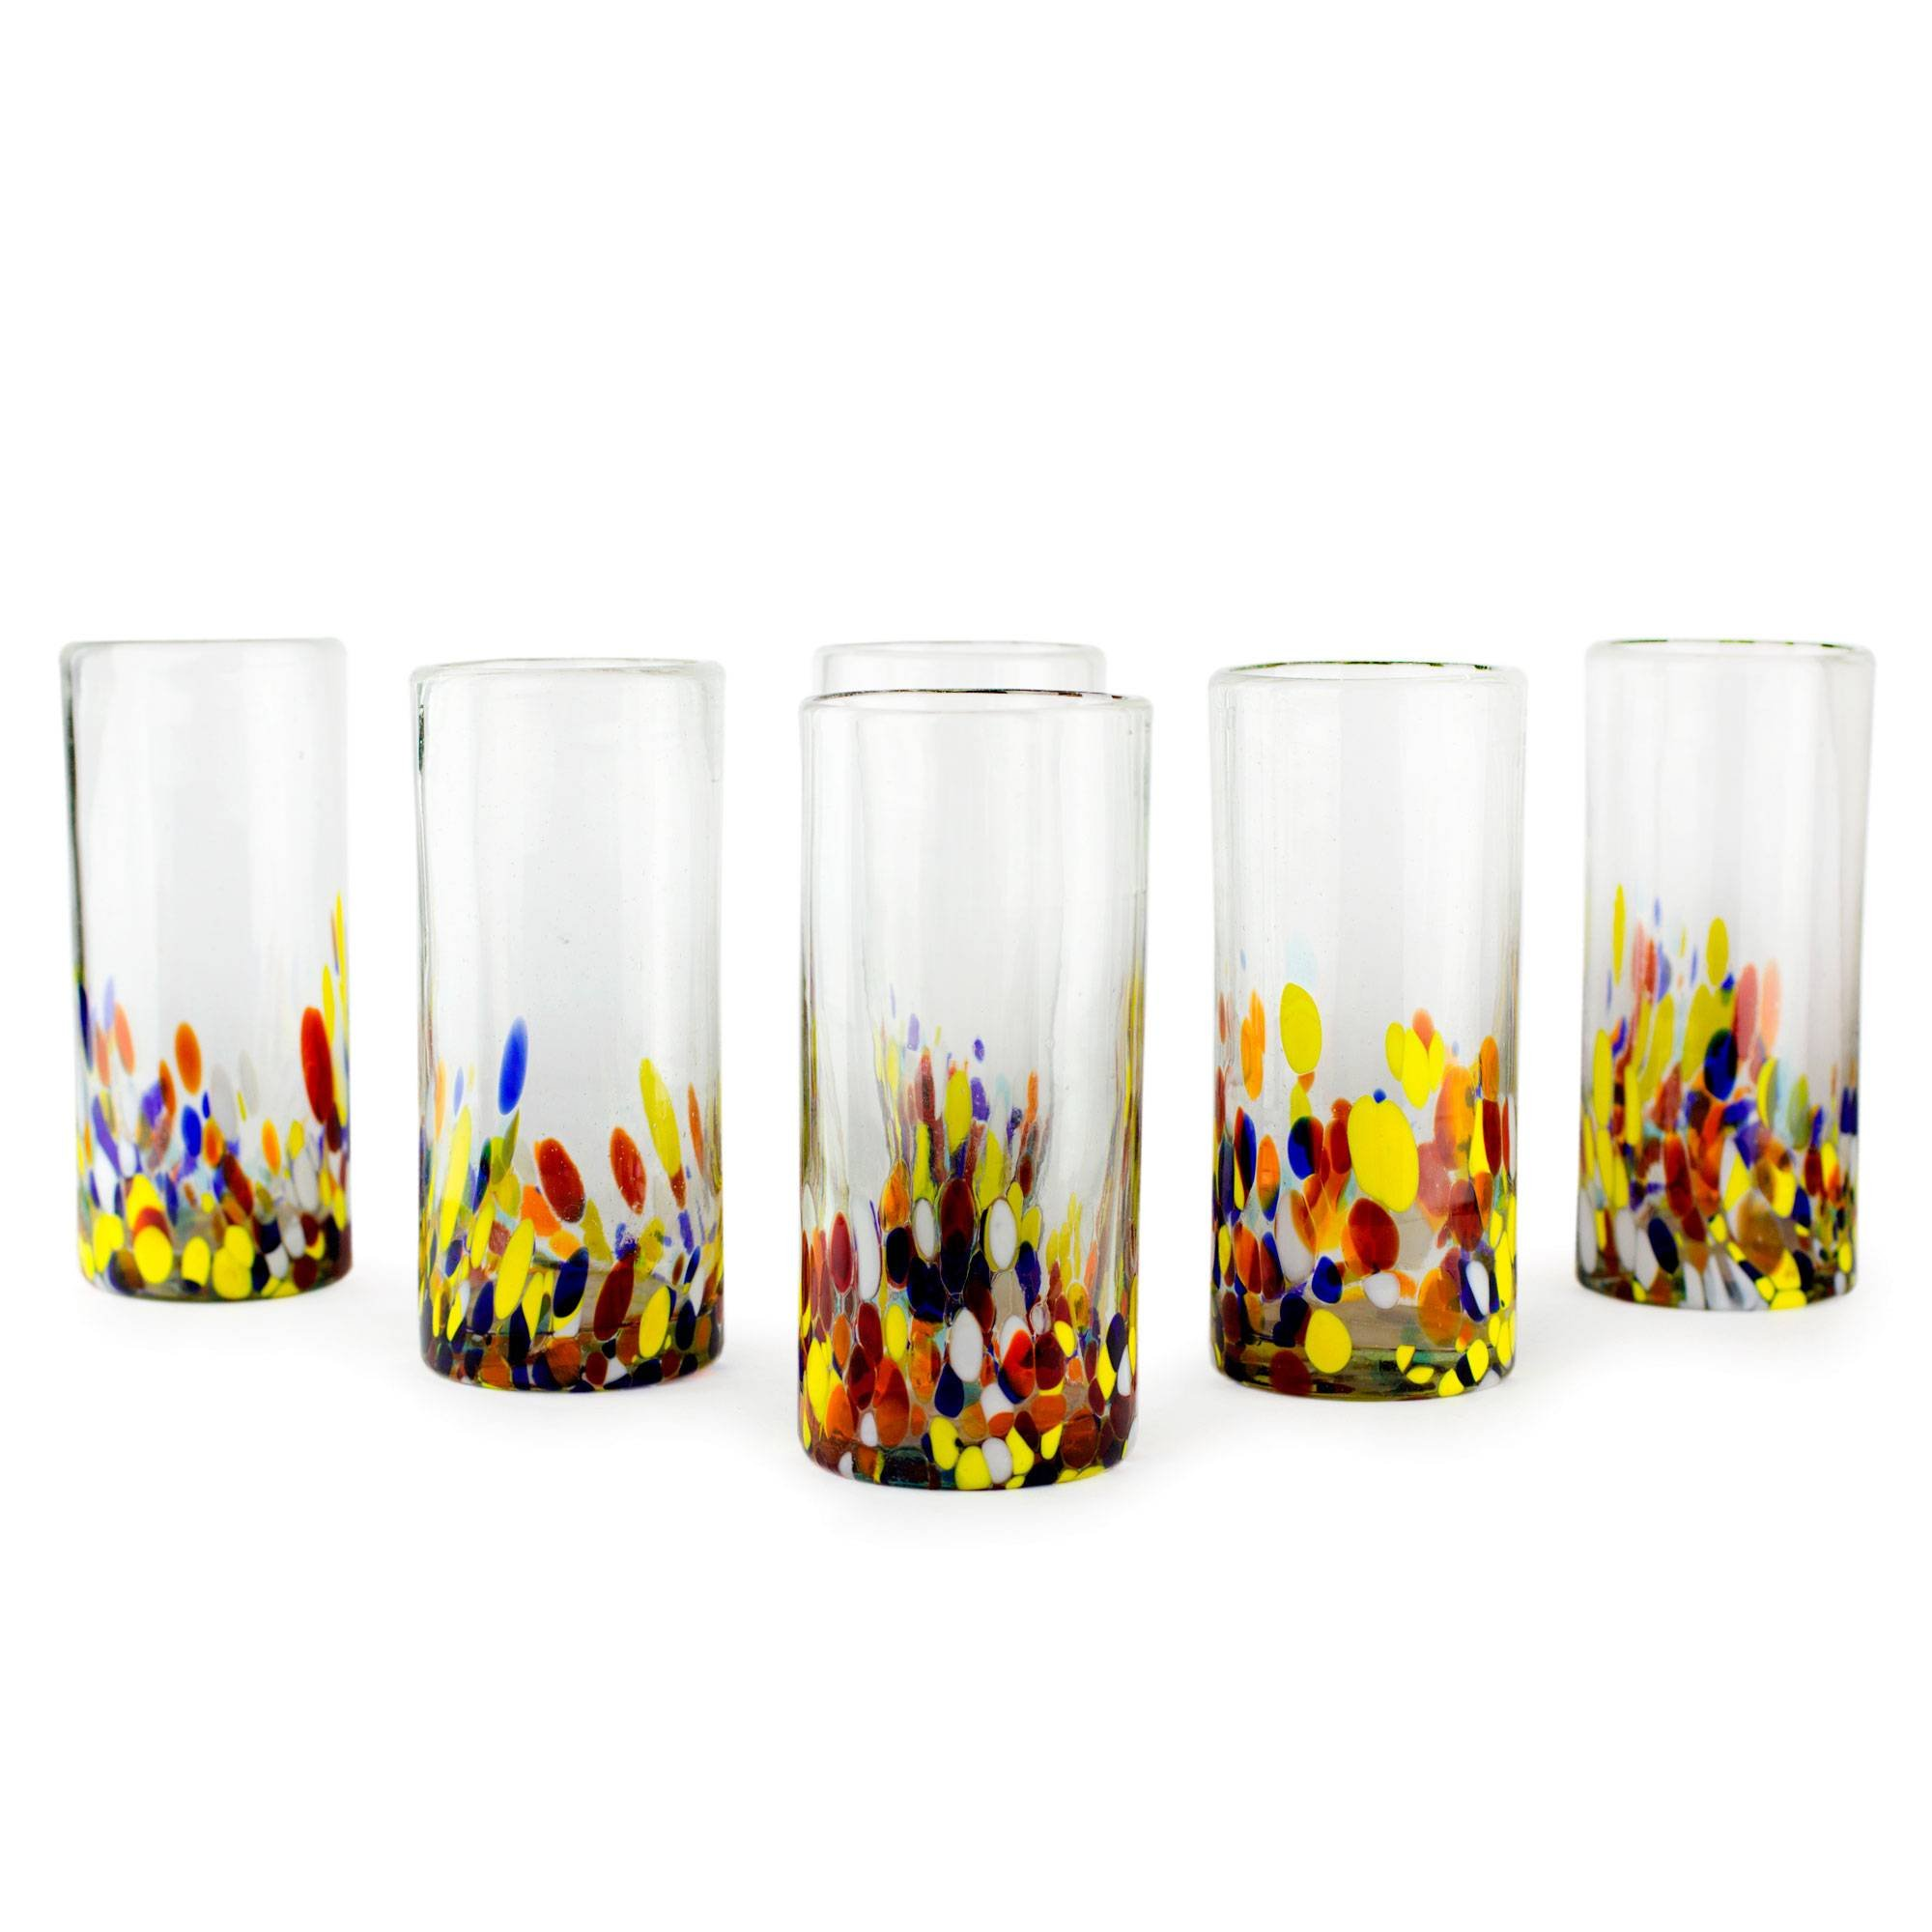 NOVICA Hand Blown Multicolor Recycled Glass Water Glasses, 19 oz 'Confetti' (set of 6)